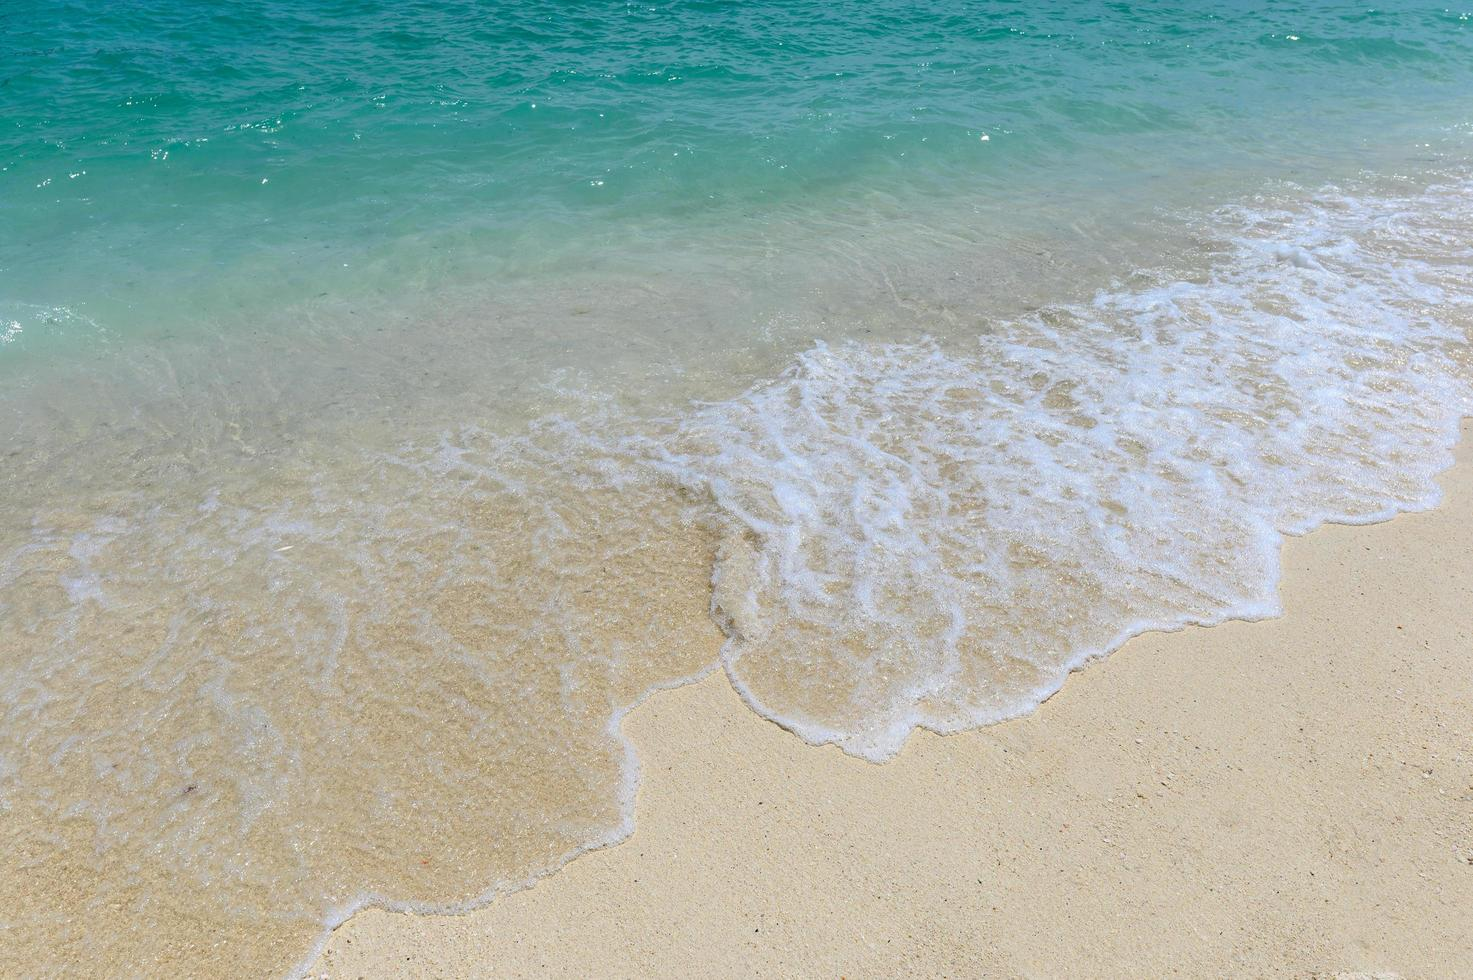 Blue waves splash on white beach photo